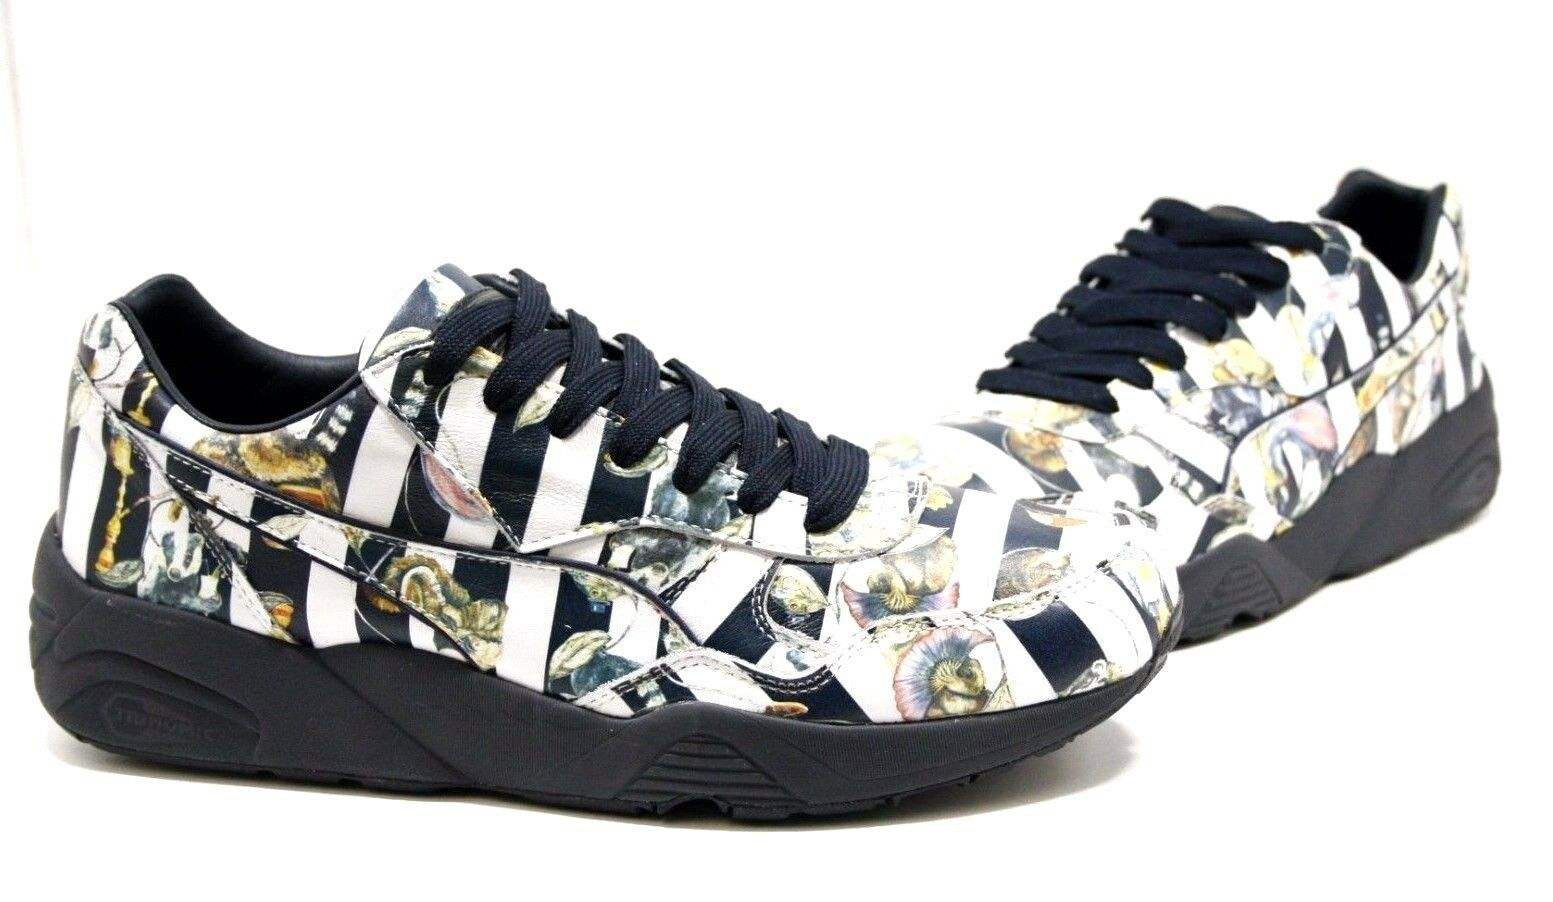 Puma Men's Shoes Trinomic R698